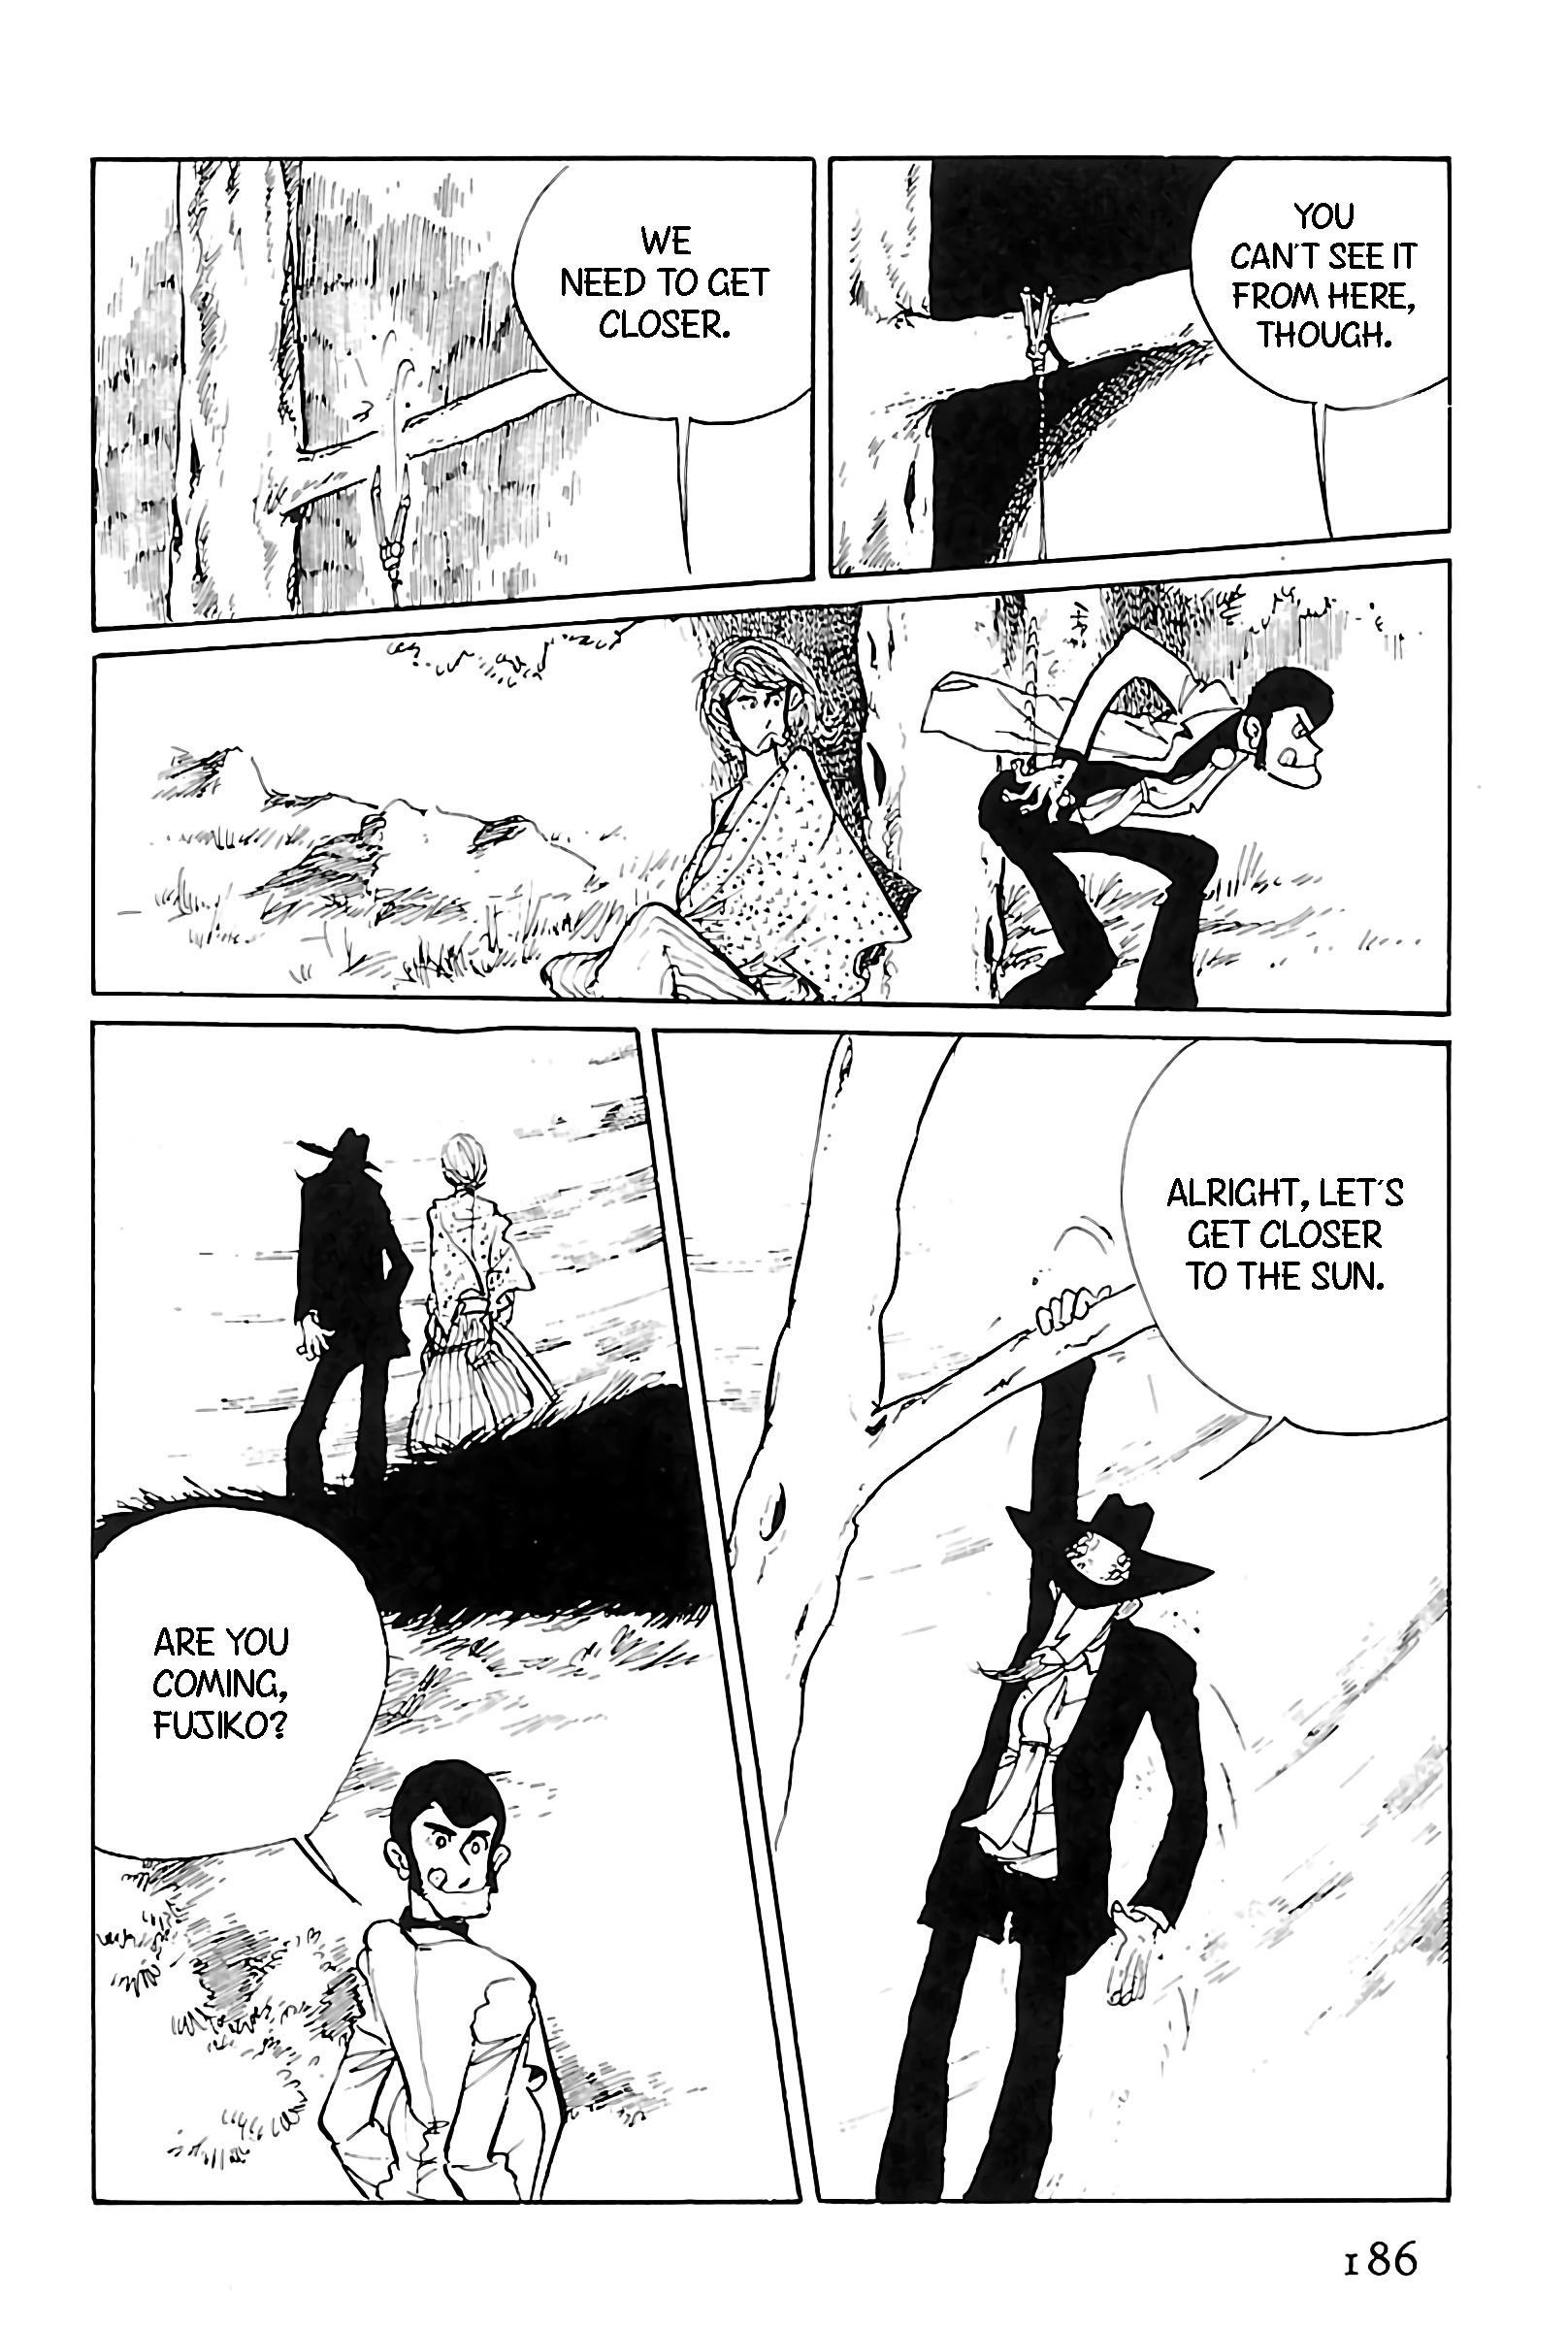 Lupin Iii: World'S Most Wanted Vol.11 Chapter 124: Happy New Year, Lupin! page 8 - Mangakakalots.com